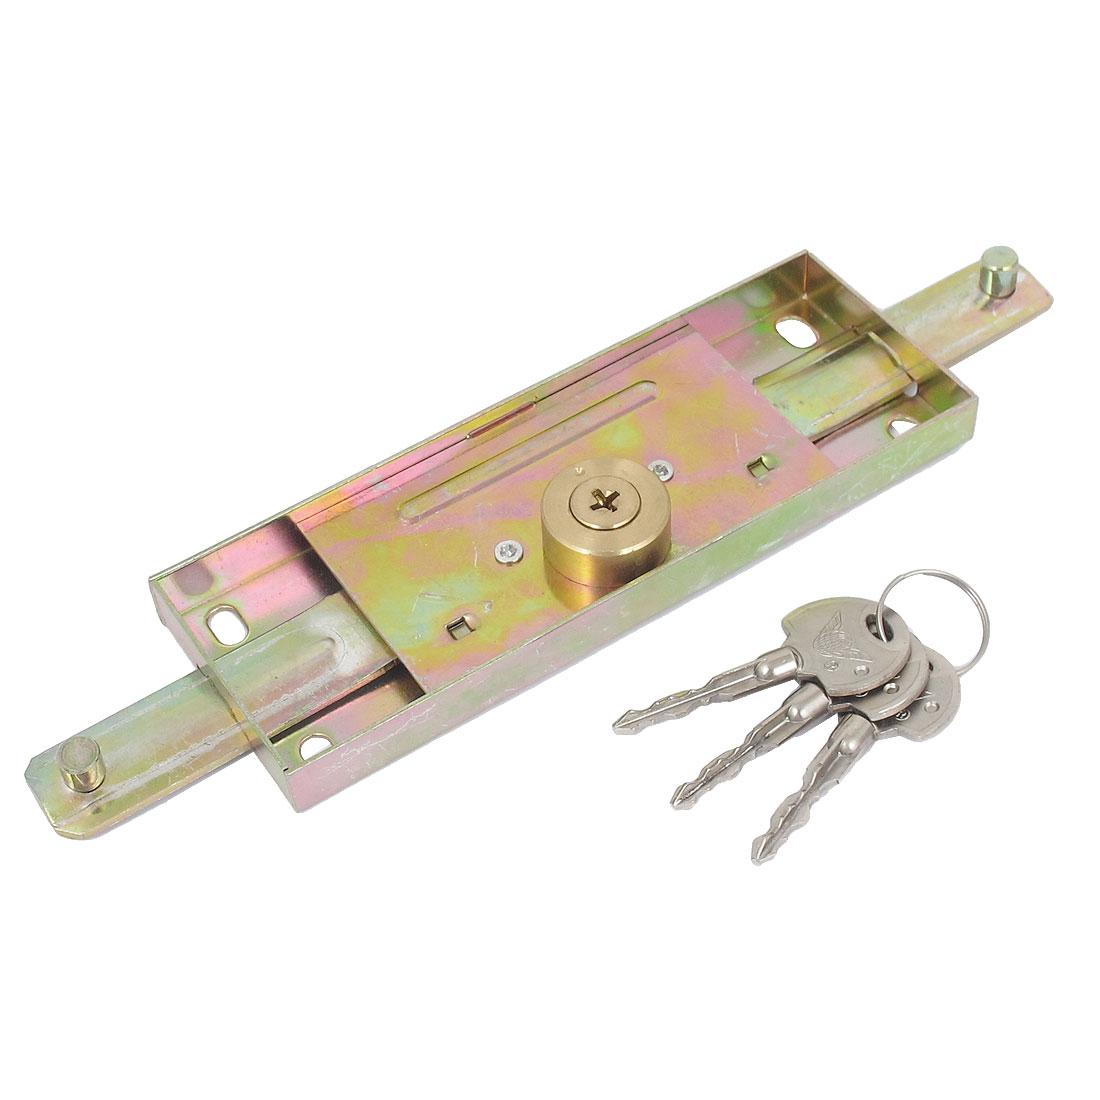 Warehouse Garage Security Vertical Locking Rolling Shutter Door Locks with Keys - image 1 of 2